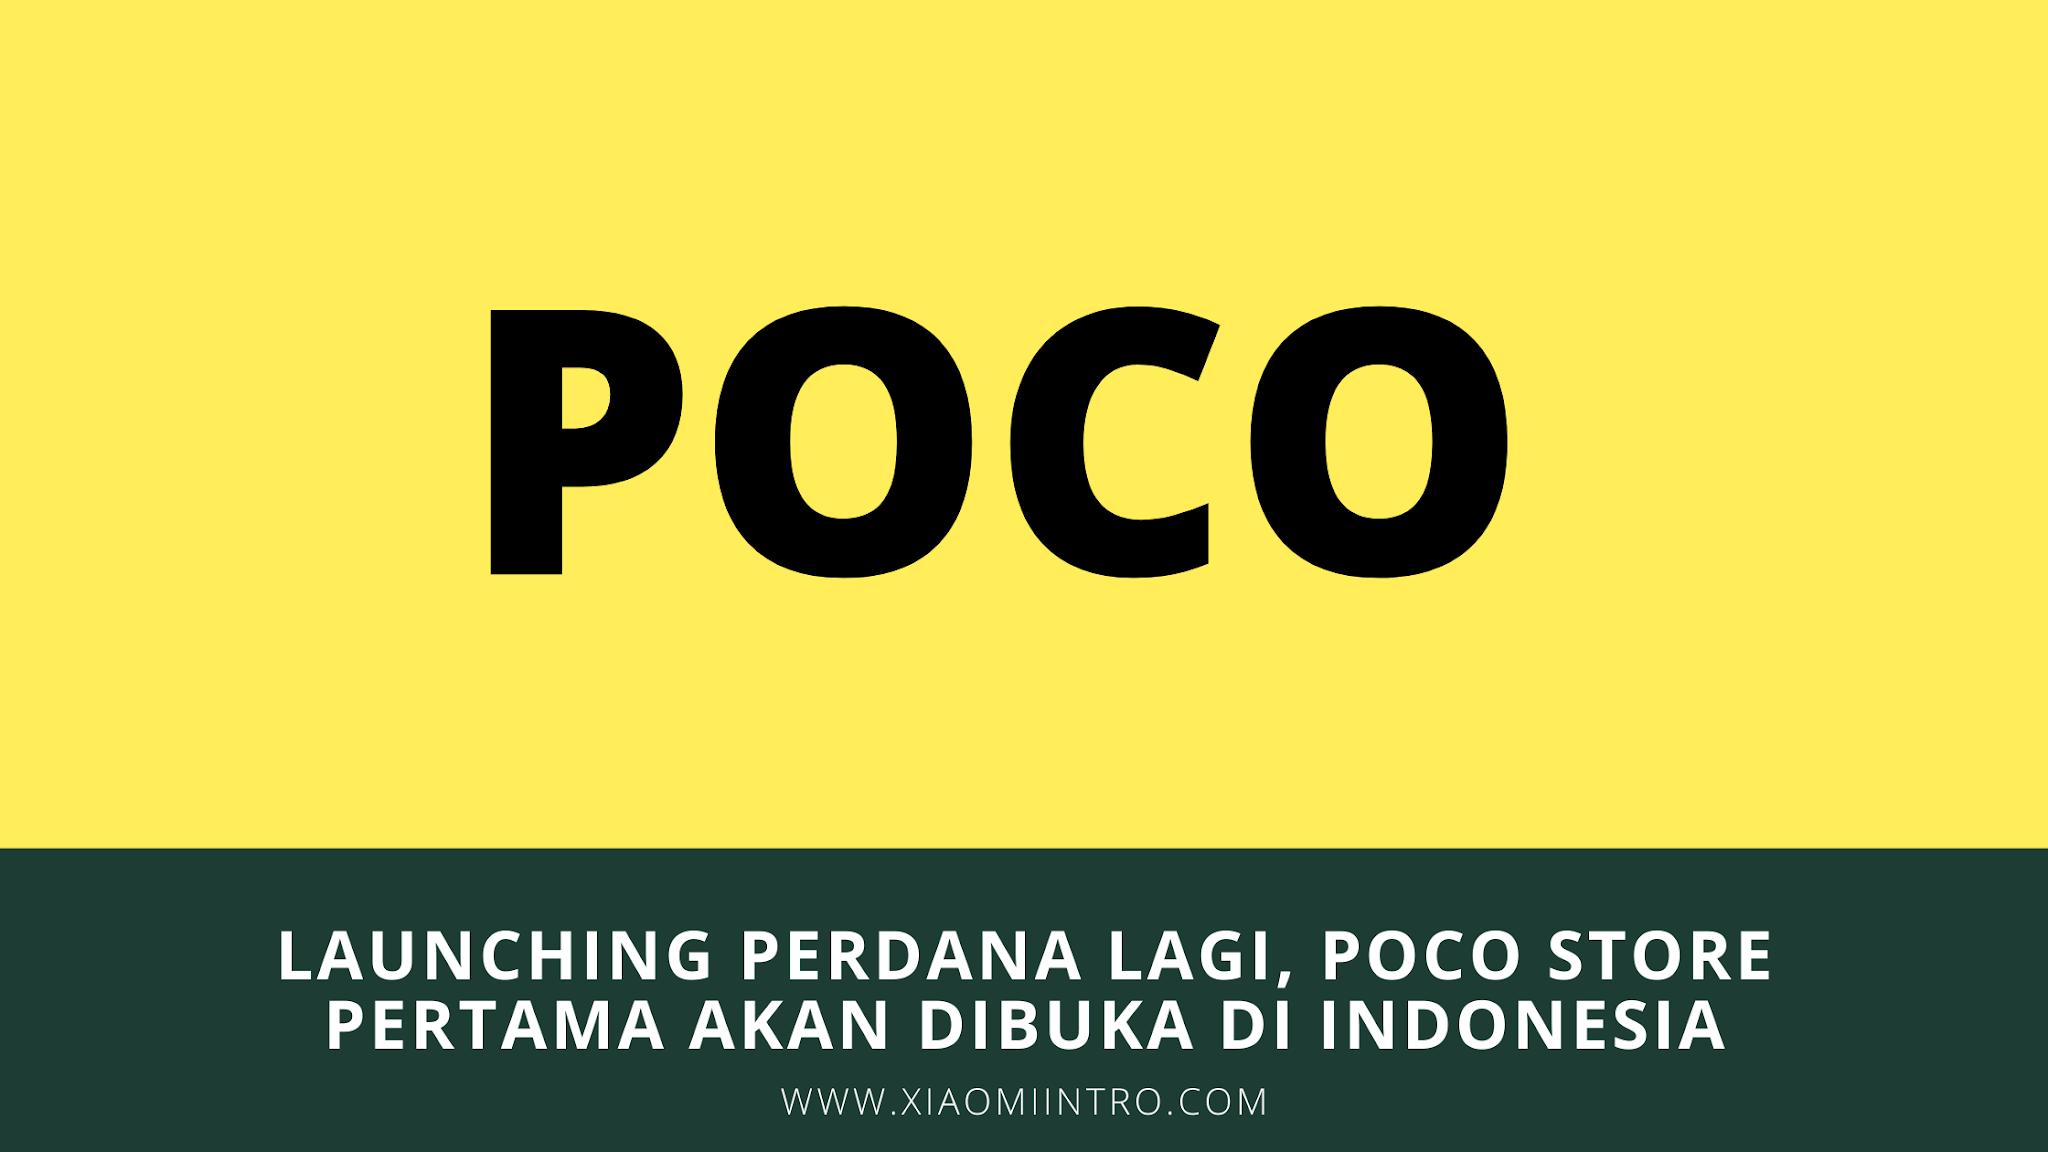 Launching Perdana Lagi, Poco Store Pertama Akan Dibuka Di Indonesia